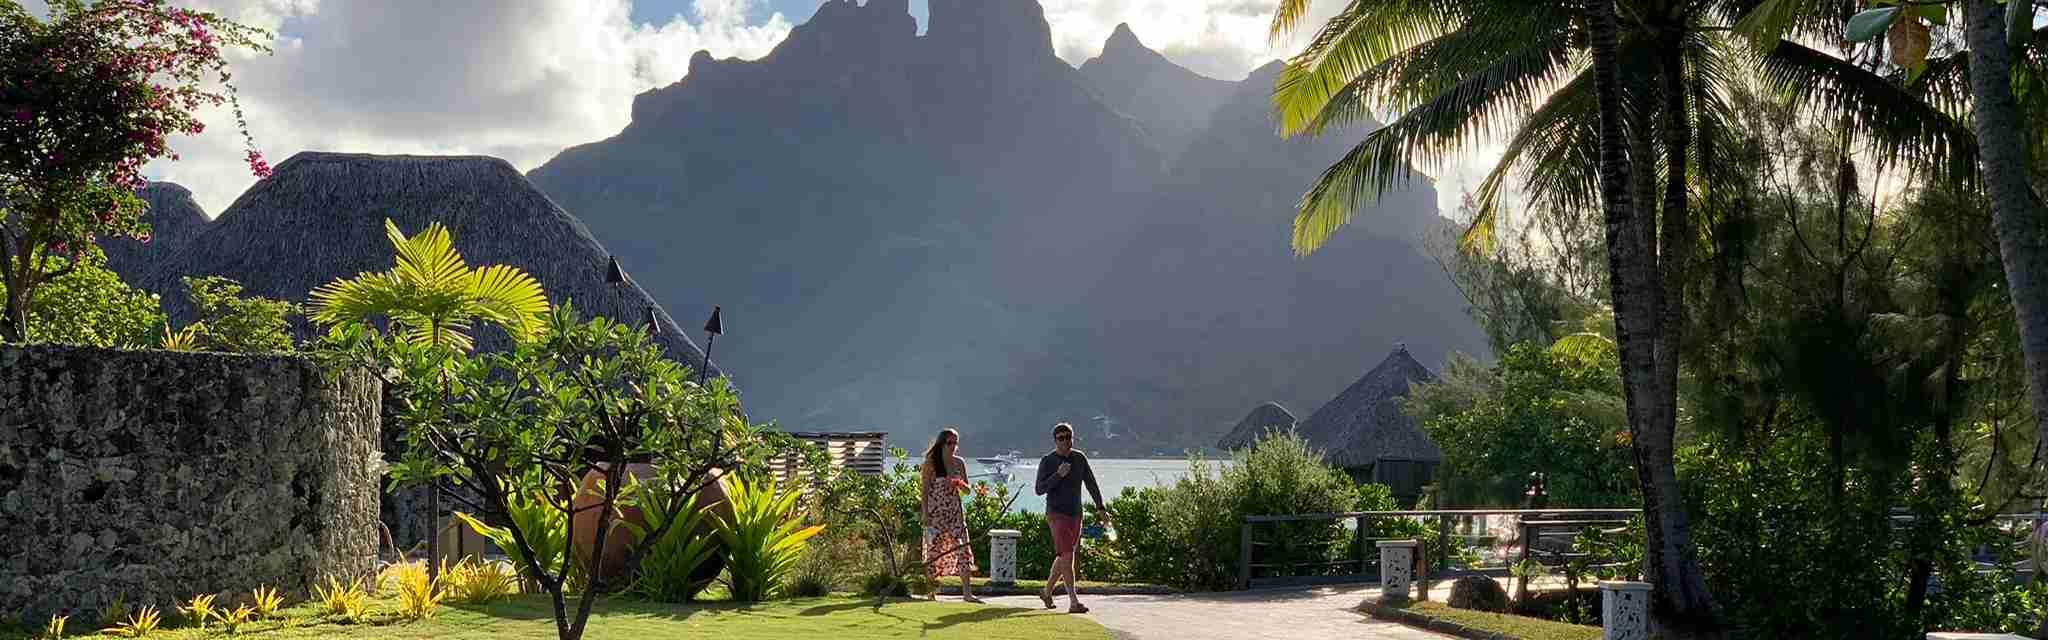 Views from the St. Regis Bora Bora